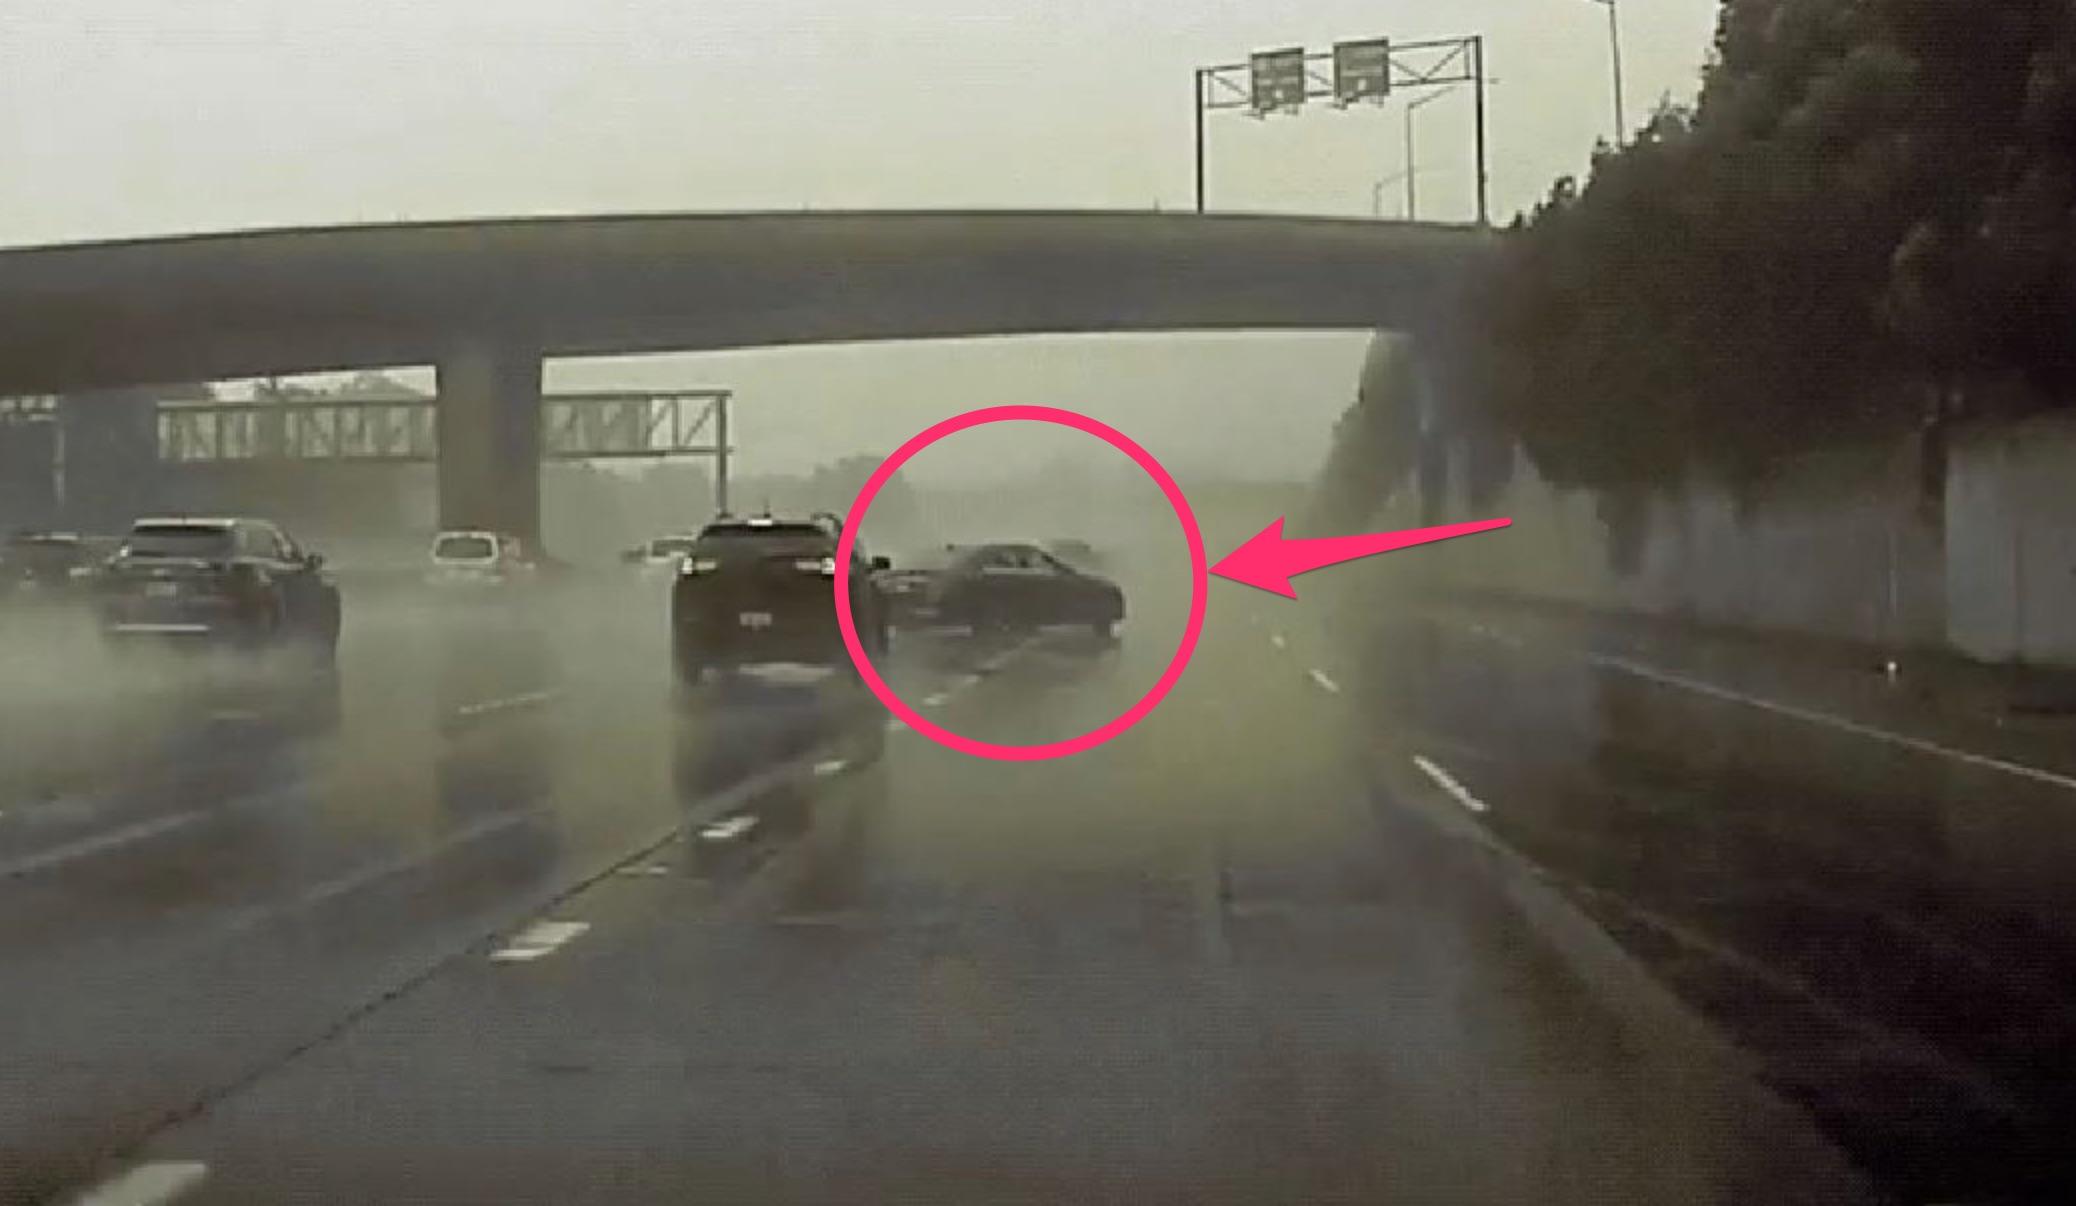 tesla-dashcam-footage-rain-accident